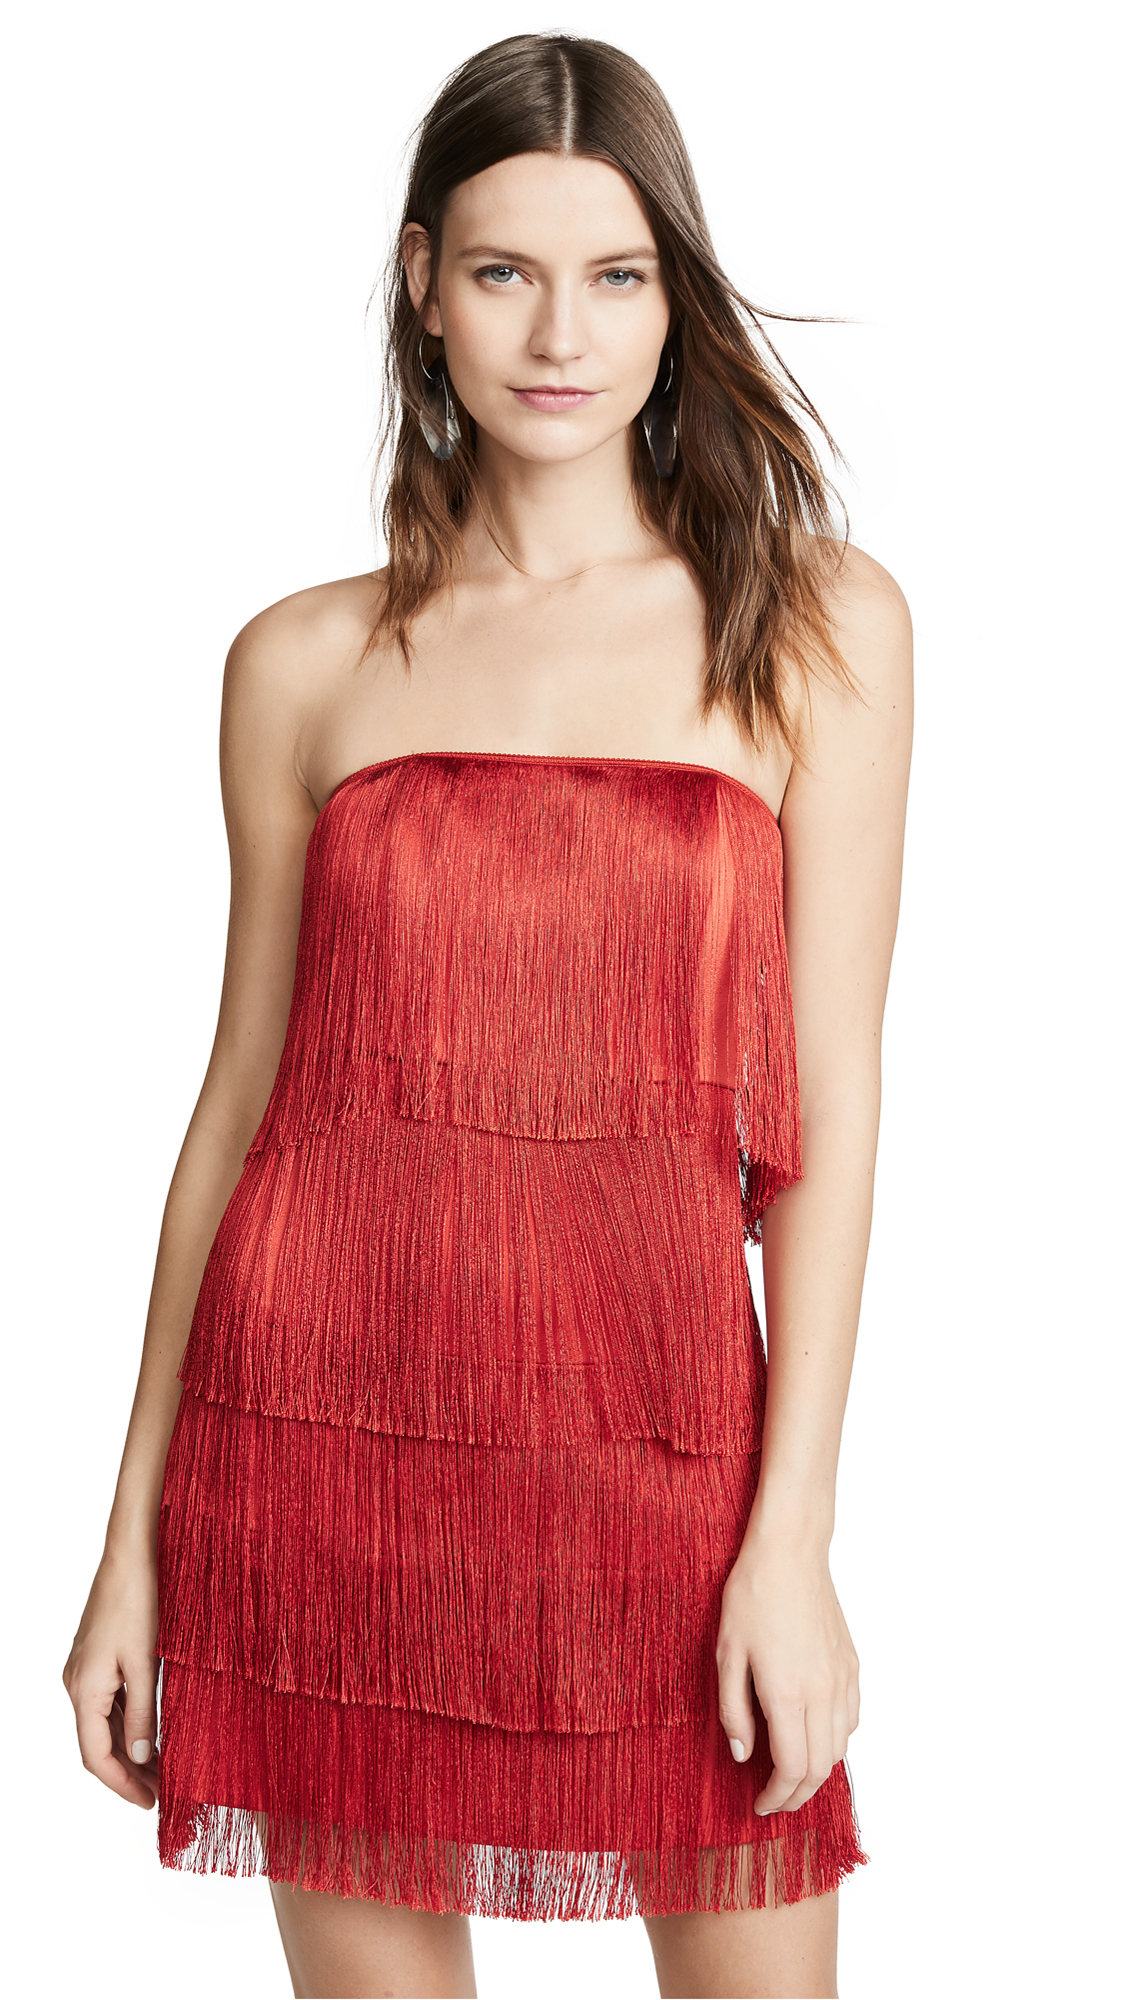 Alexis Rosmund Dress - Jordan Sand